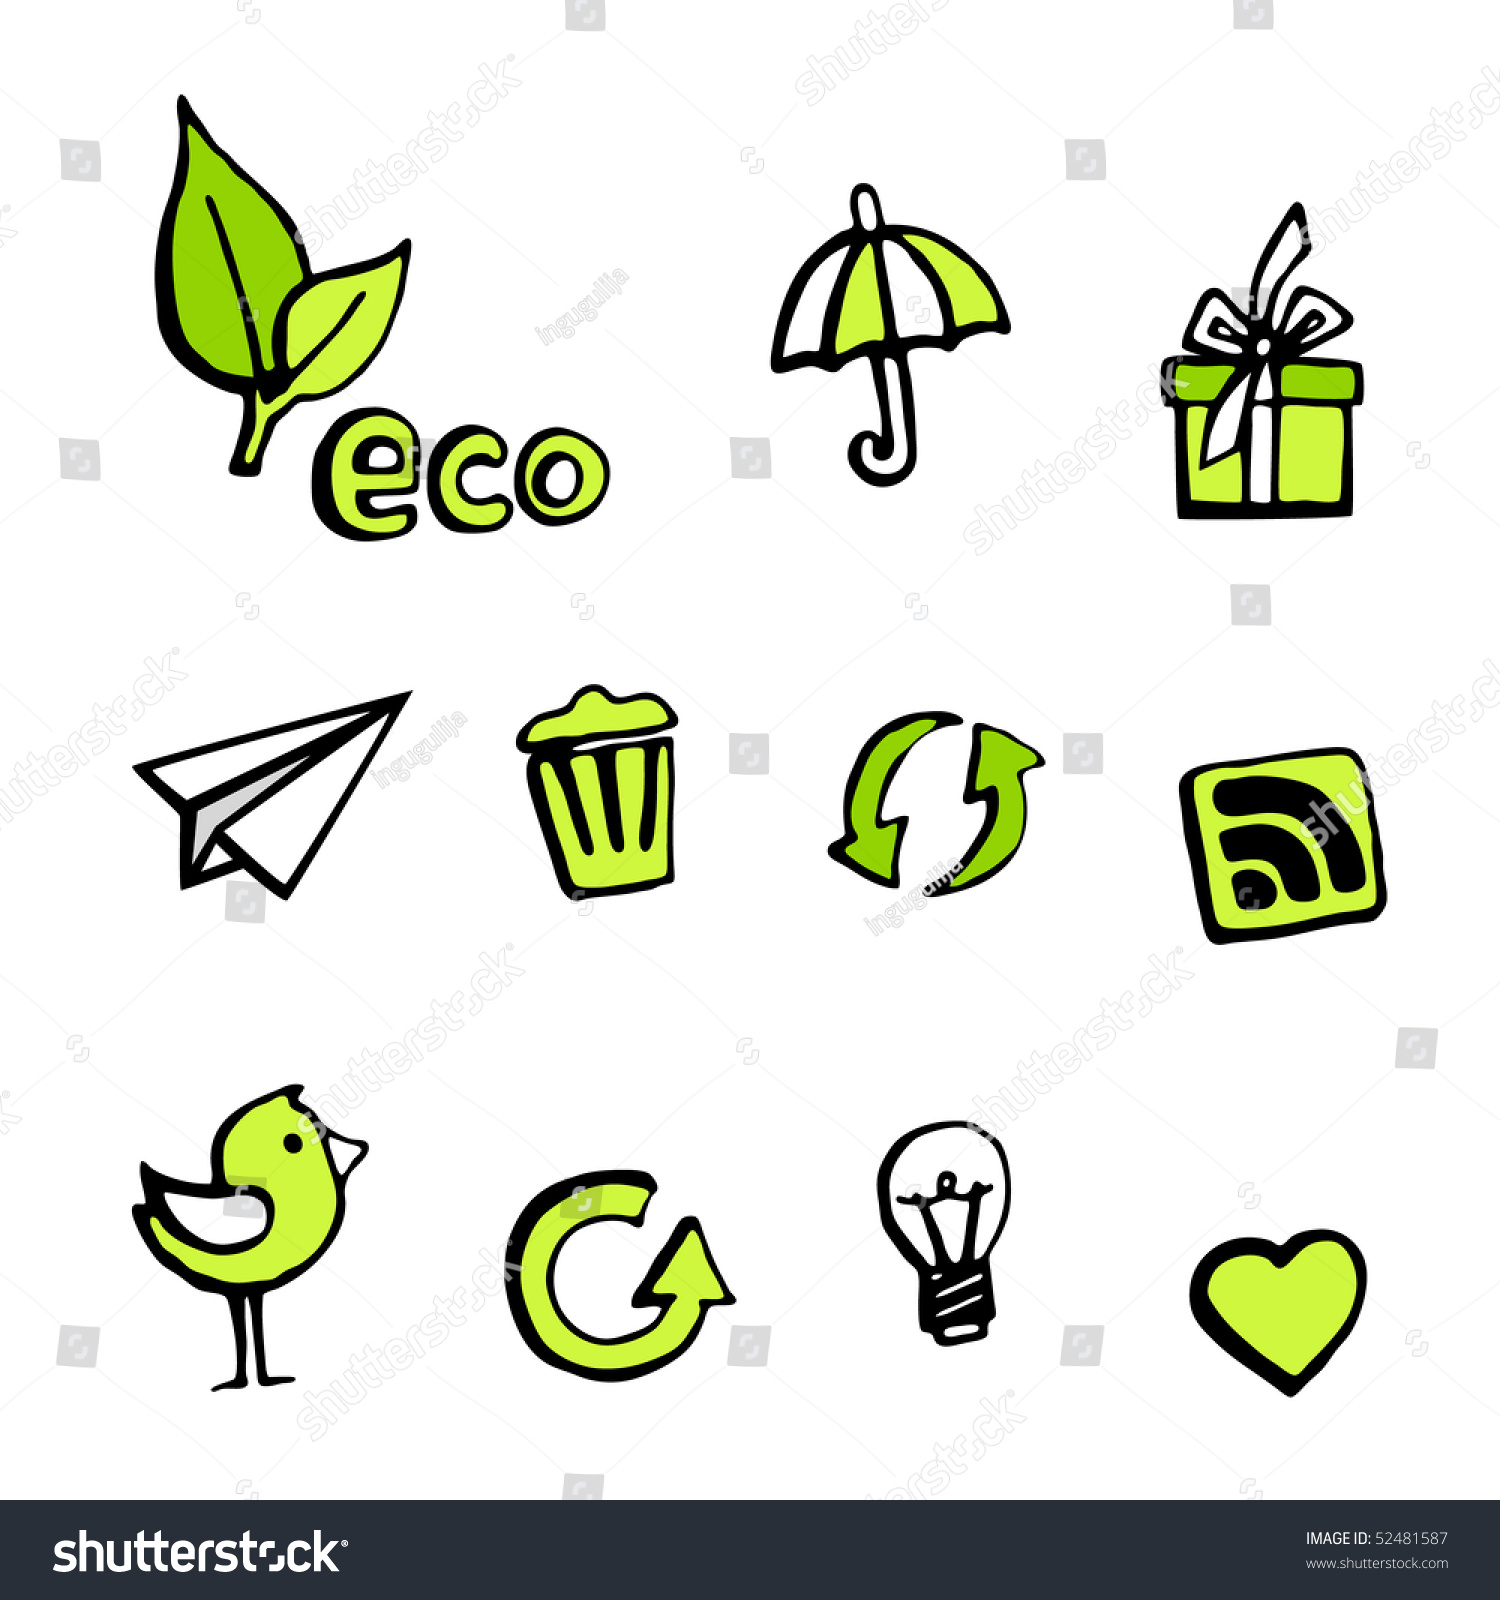 logo logo 标志 动漫 卡通 漫画 设计 头像 图标 1500_1600